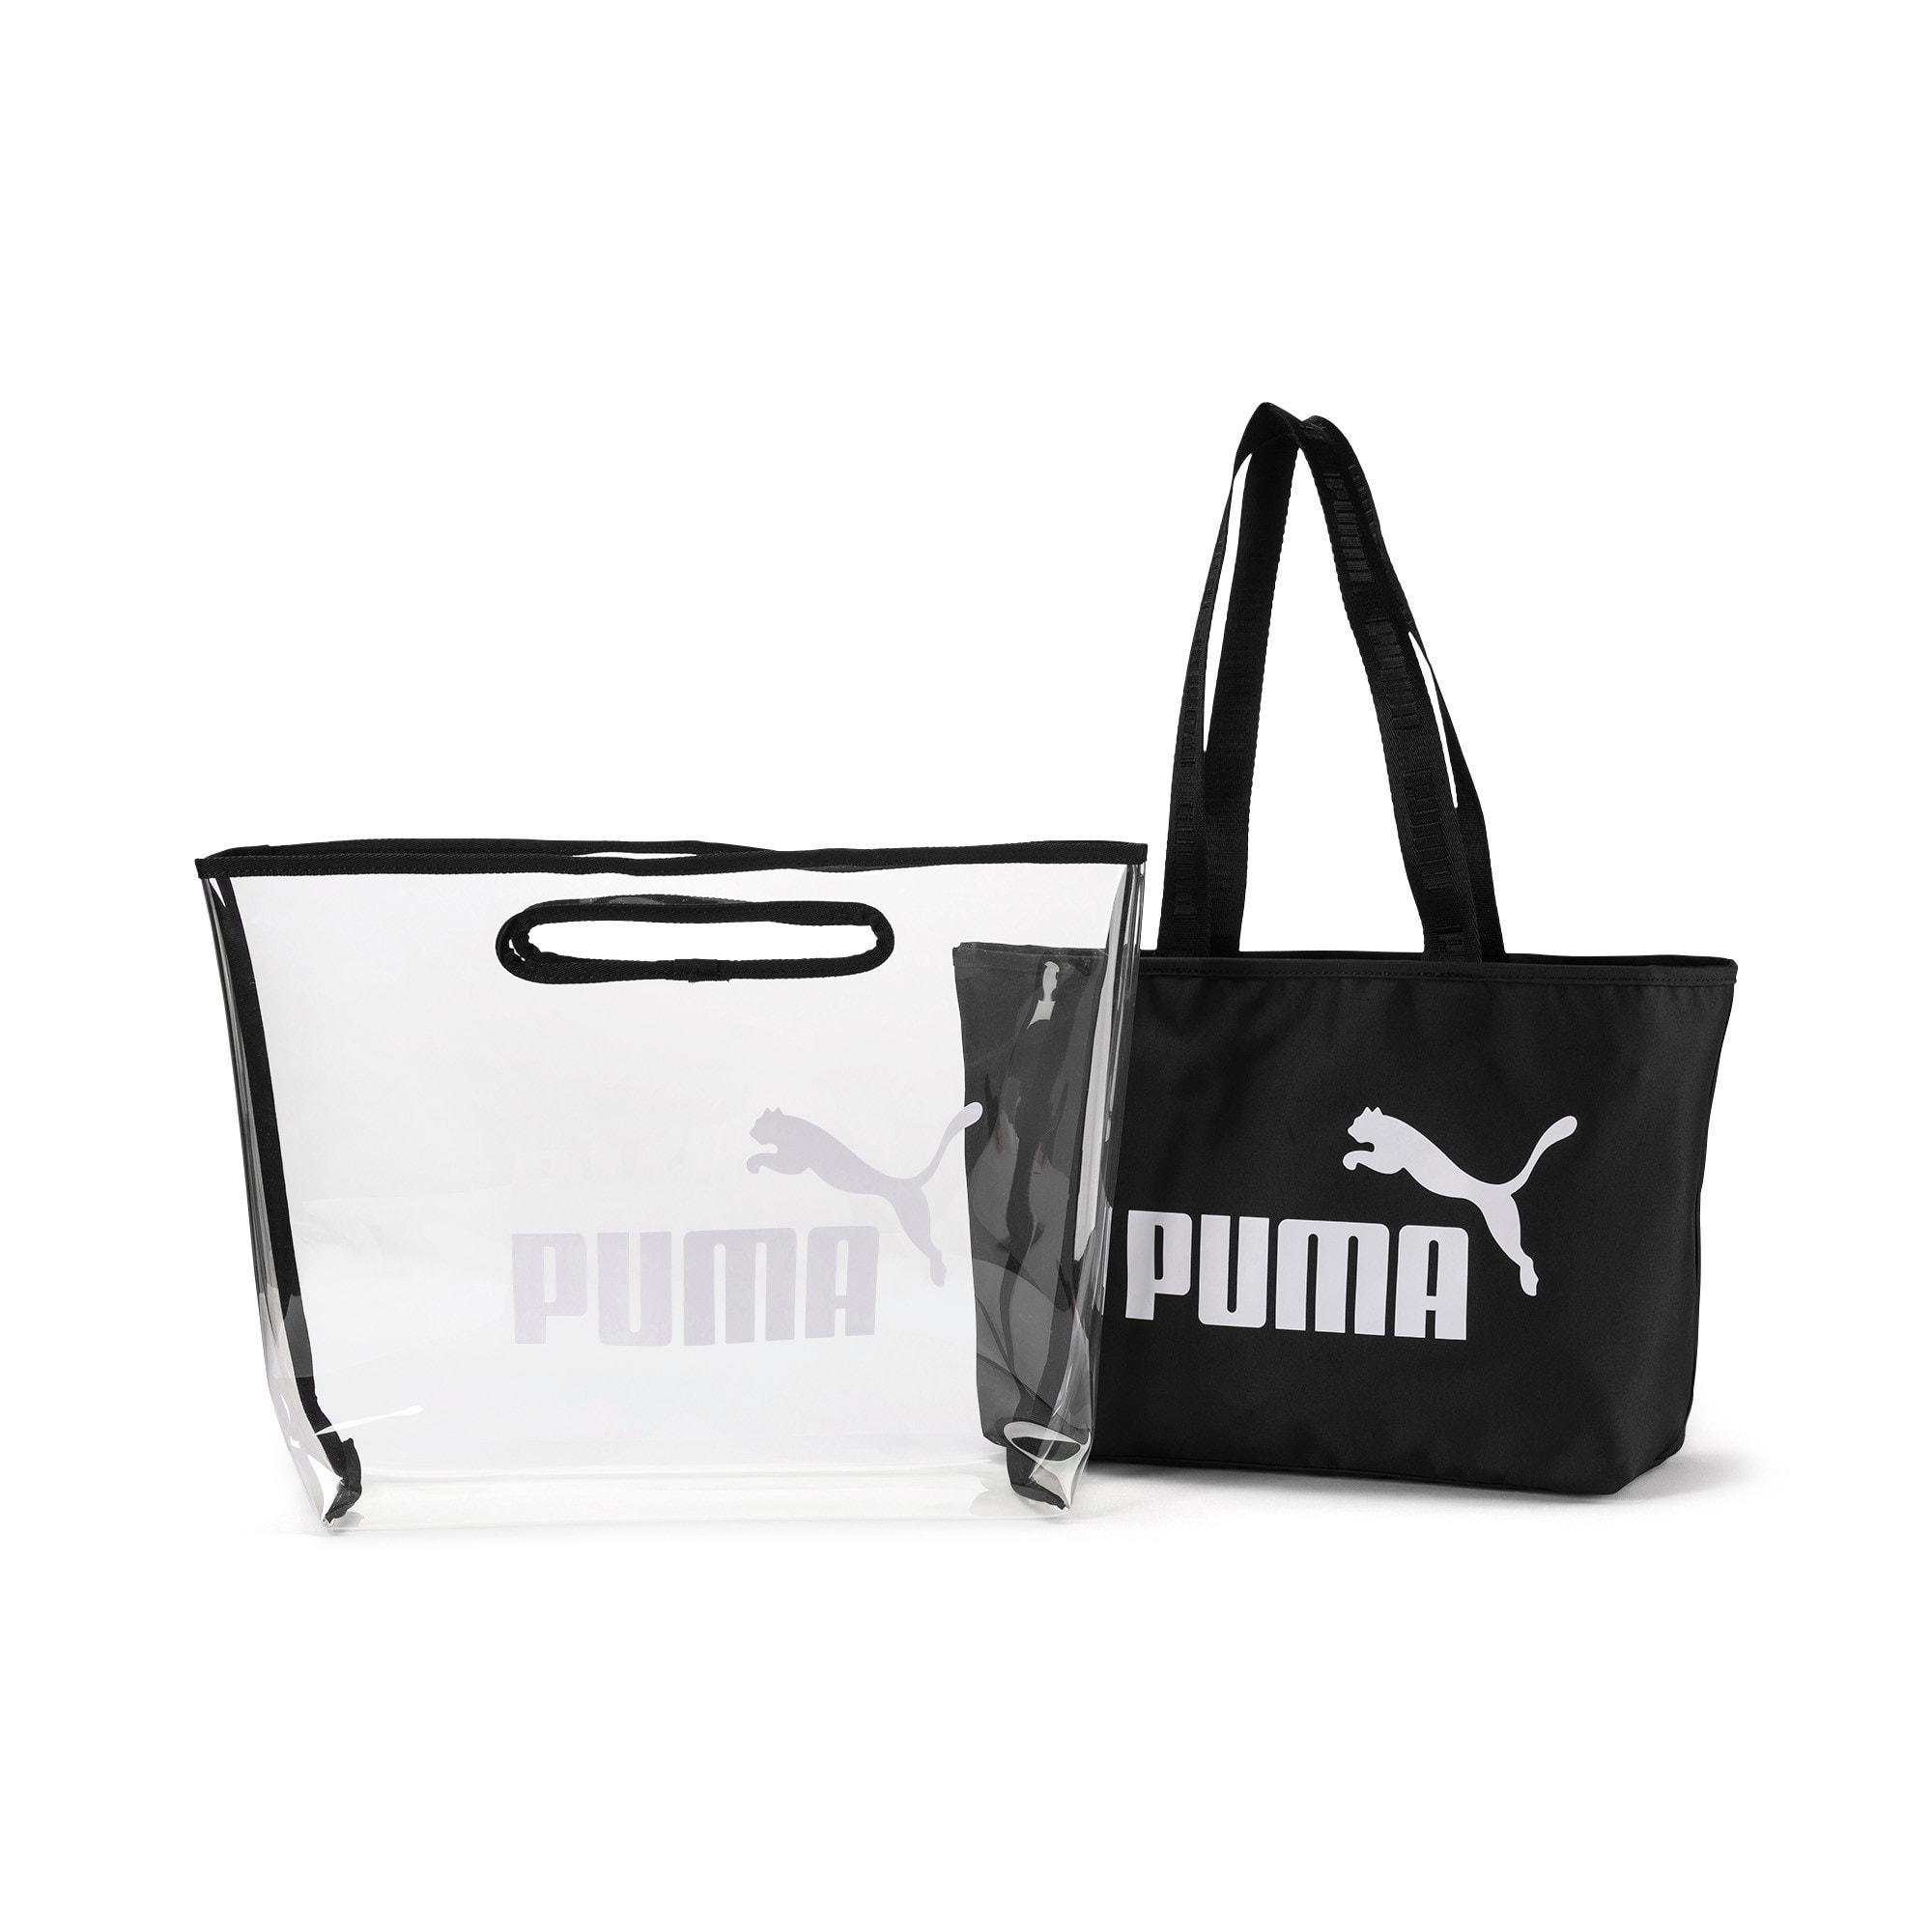 Thumbnail 3 of Women's Twin Shopper, Puma Black, medium